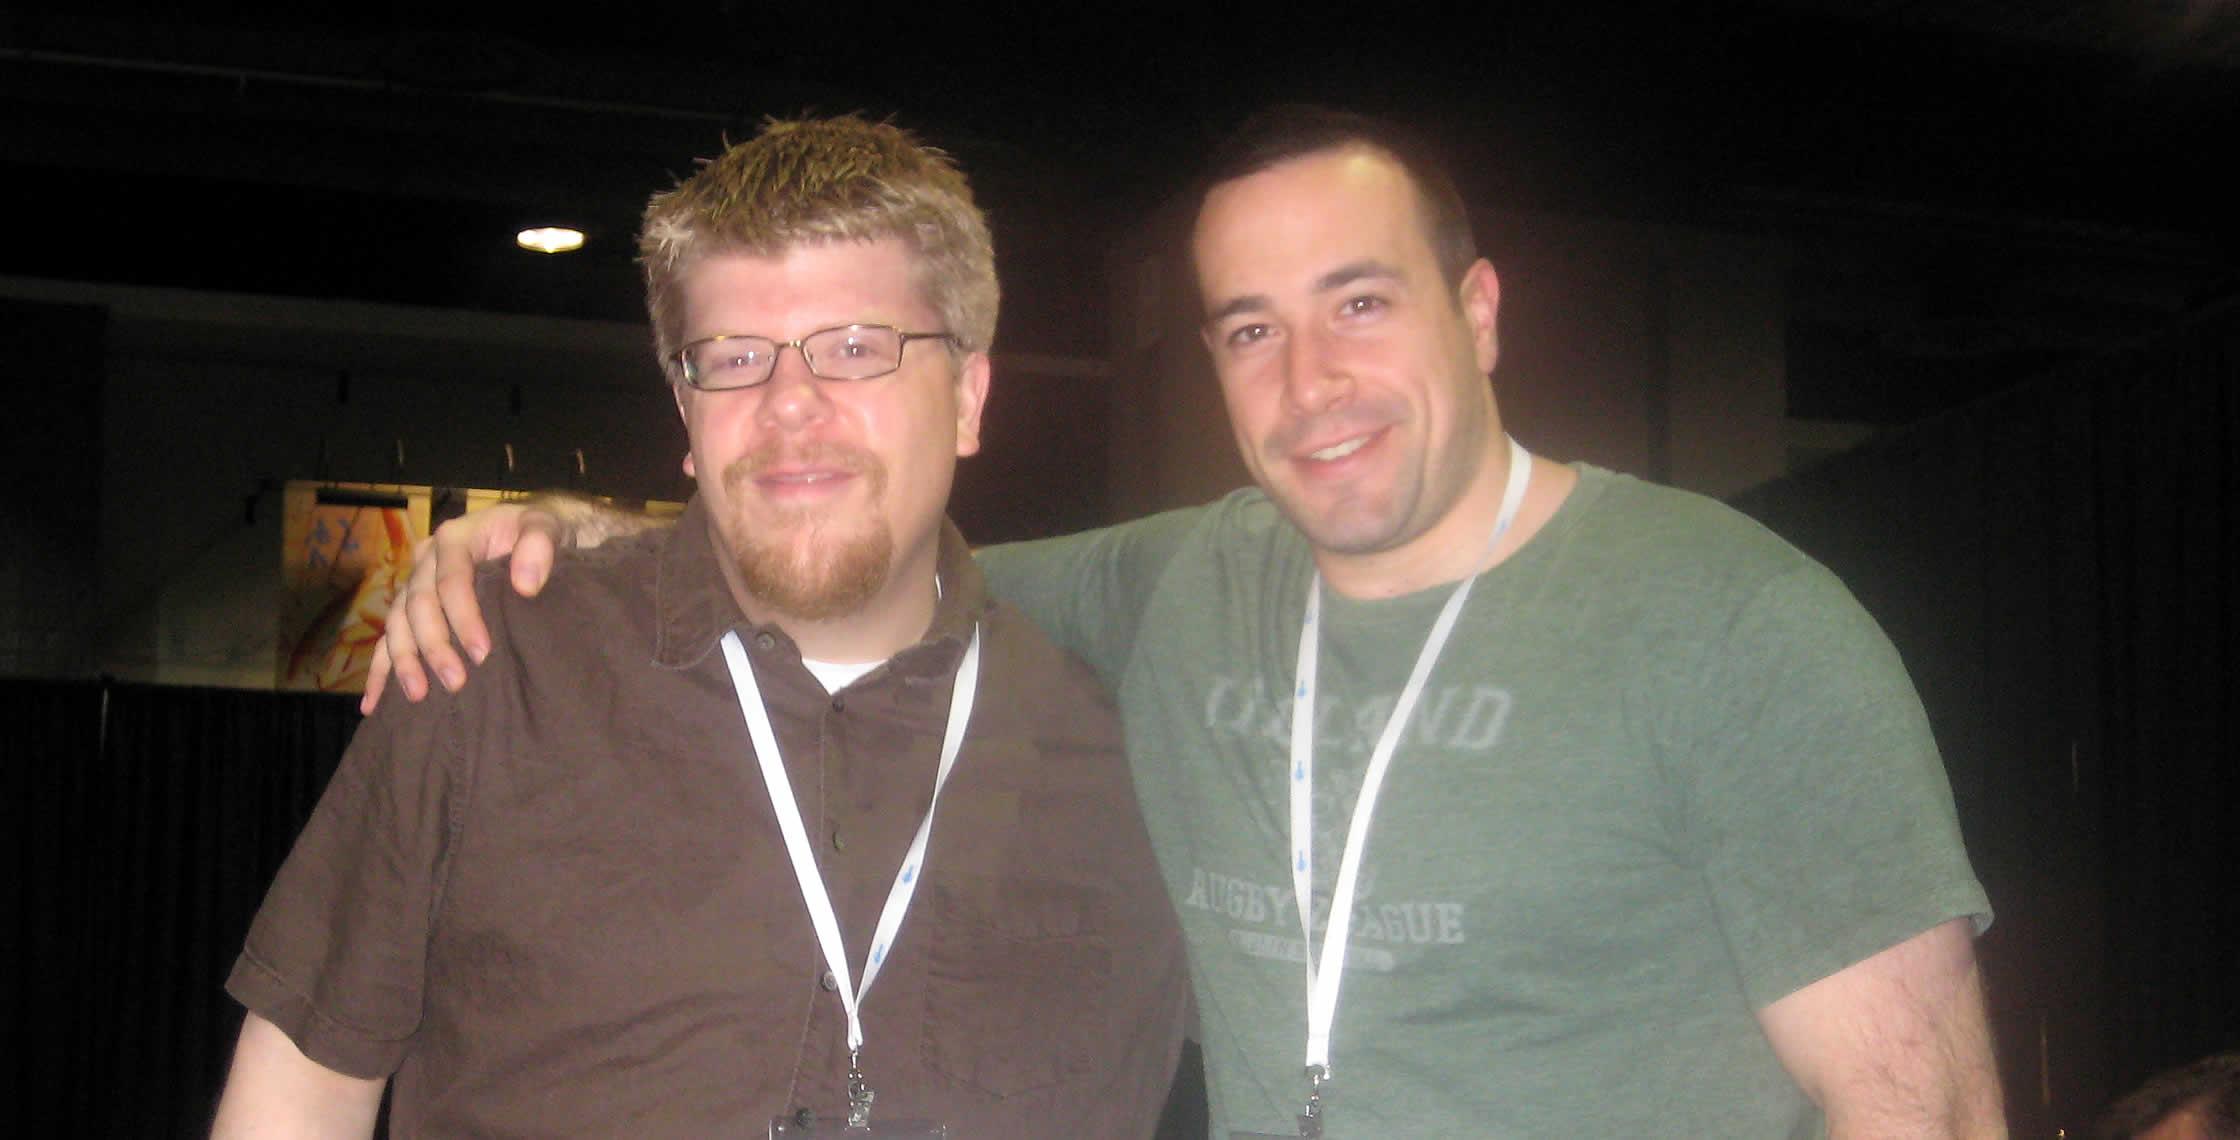 Ben Nadel at CFUNITED 2008 (Washington, D.C.) with: Matt Woodward